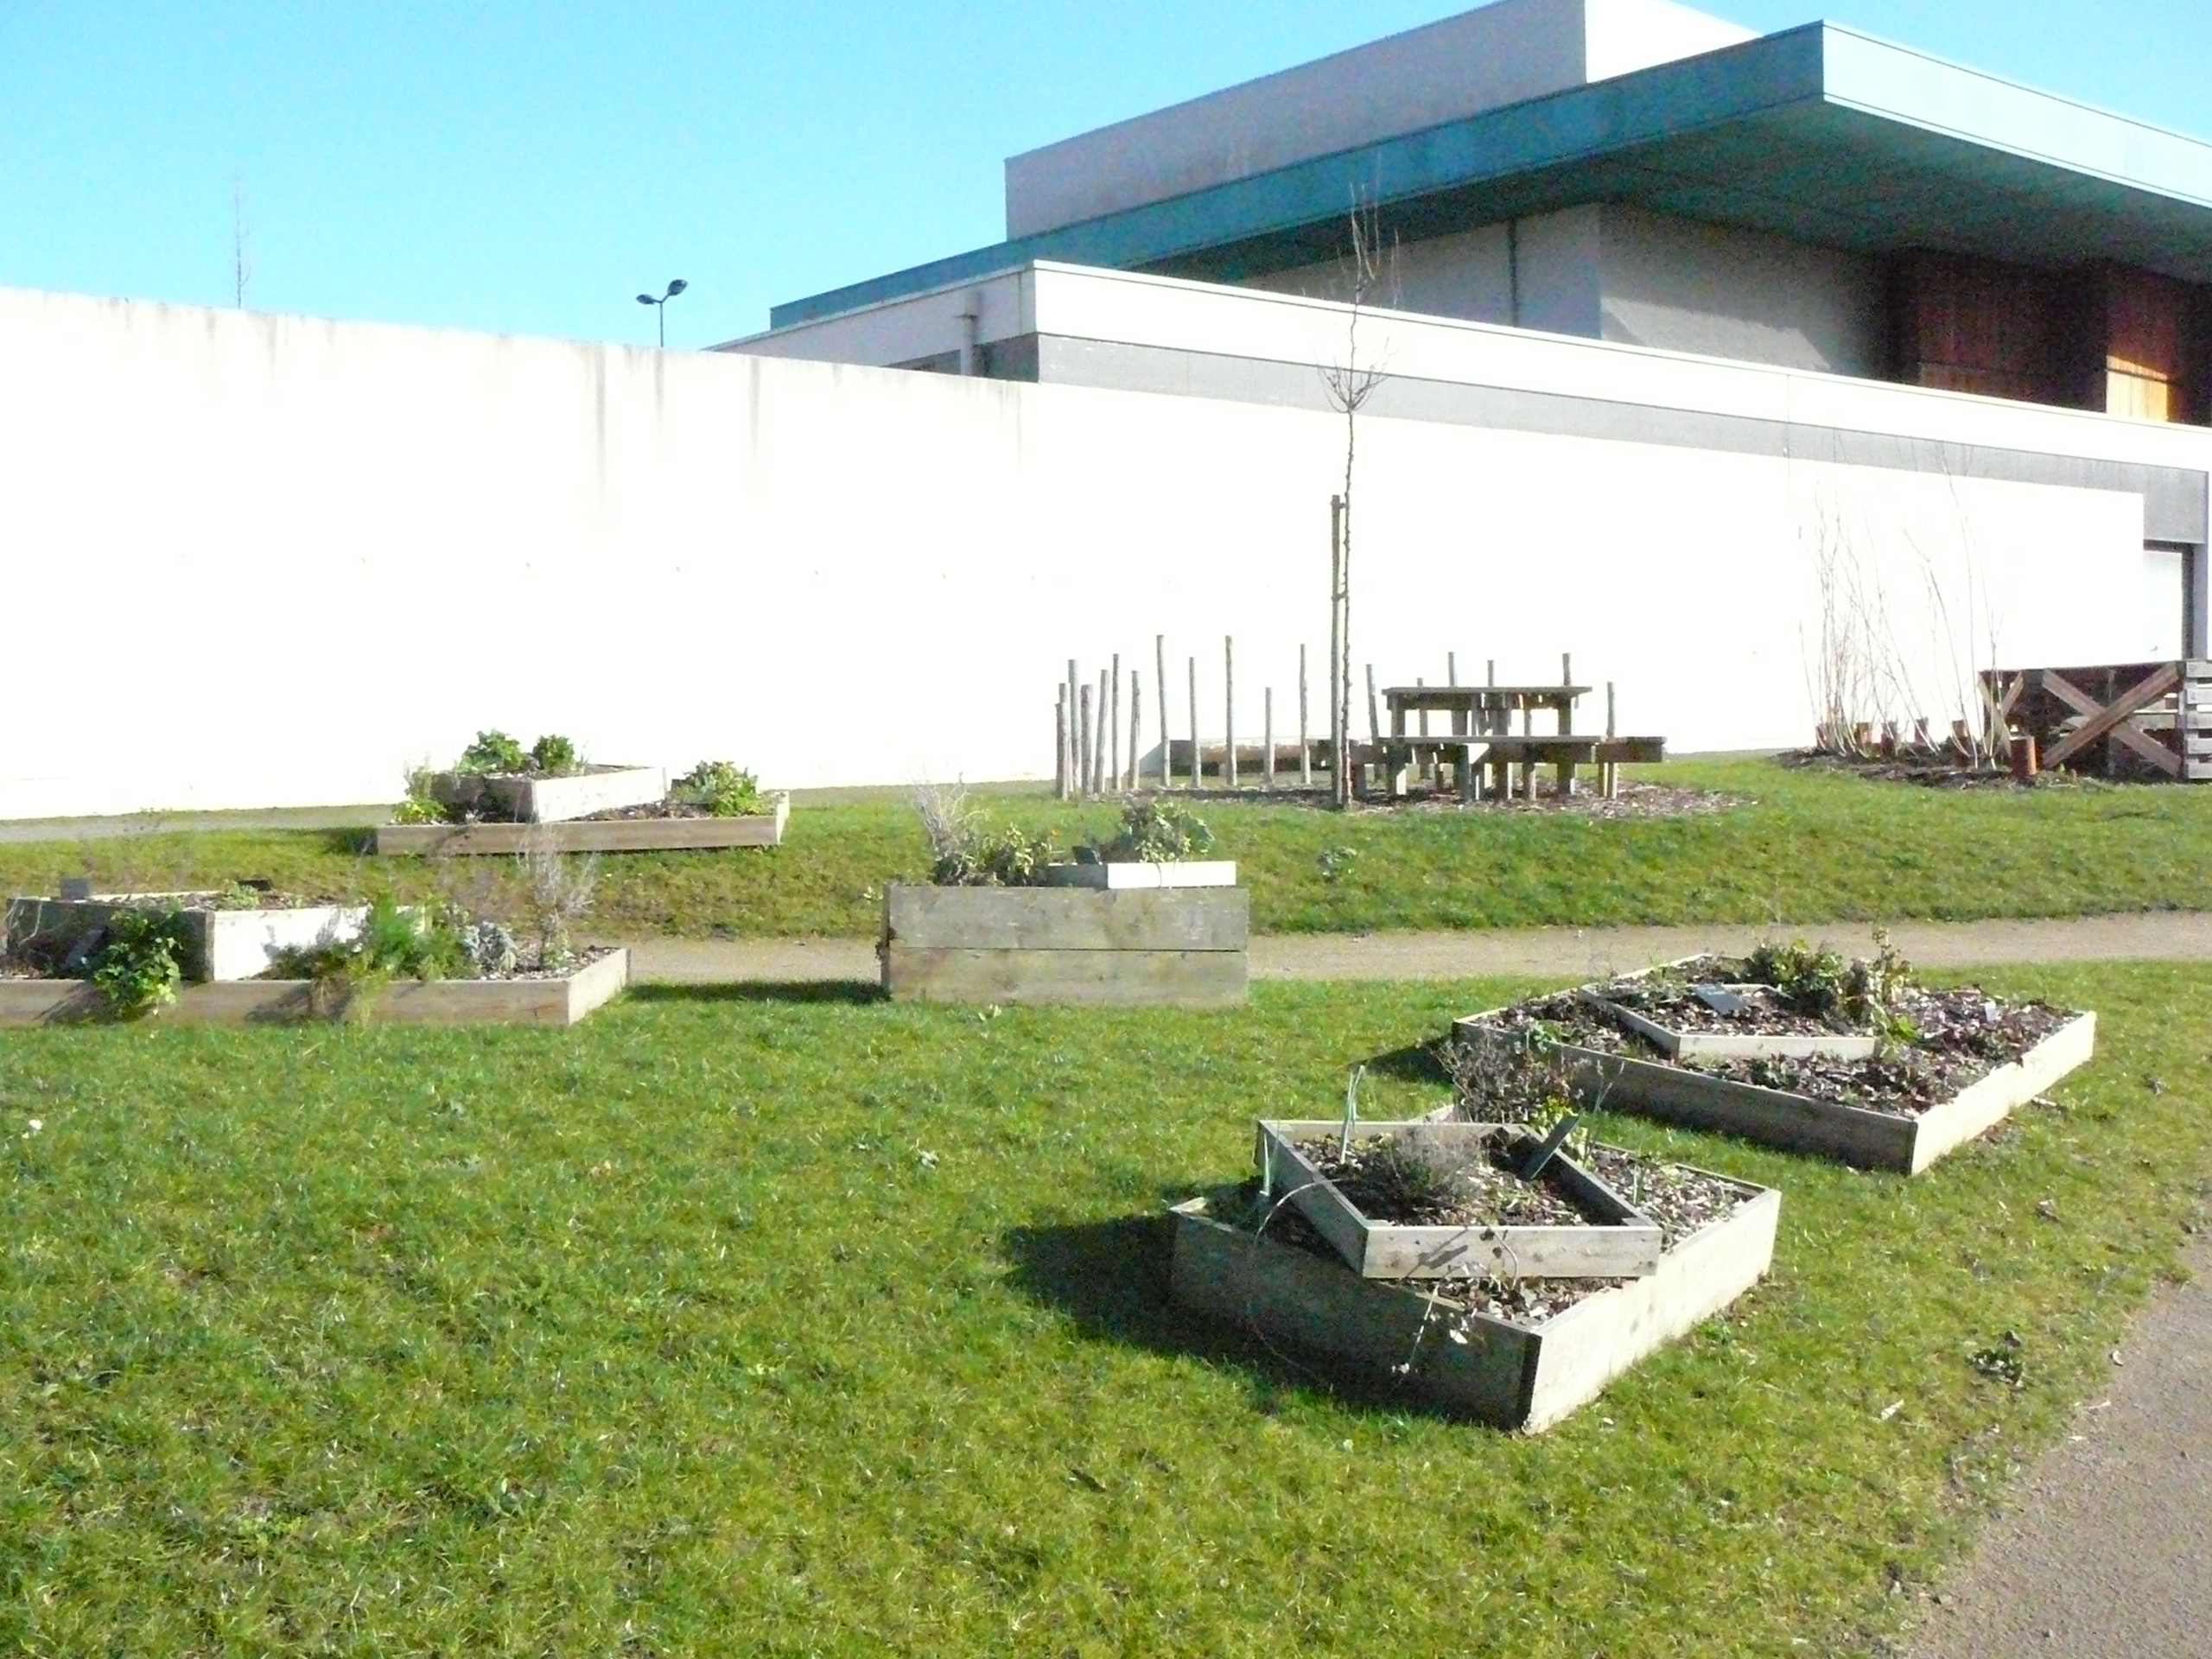 Jardin extraordinaire plerin vert le jardin for Jardin extraordinaire